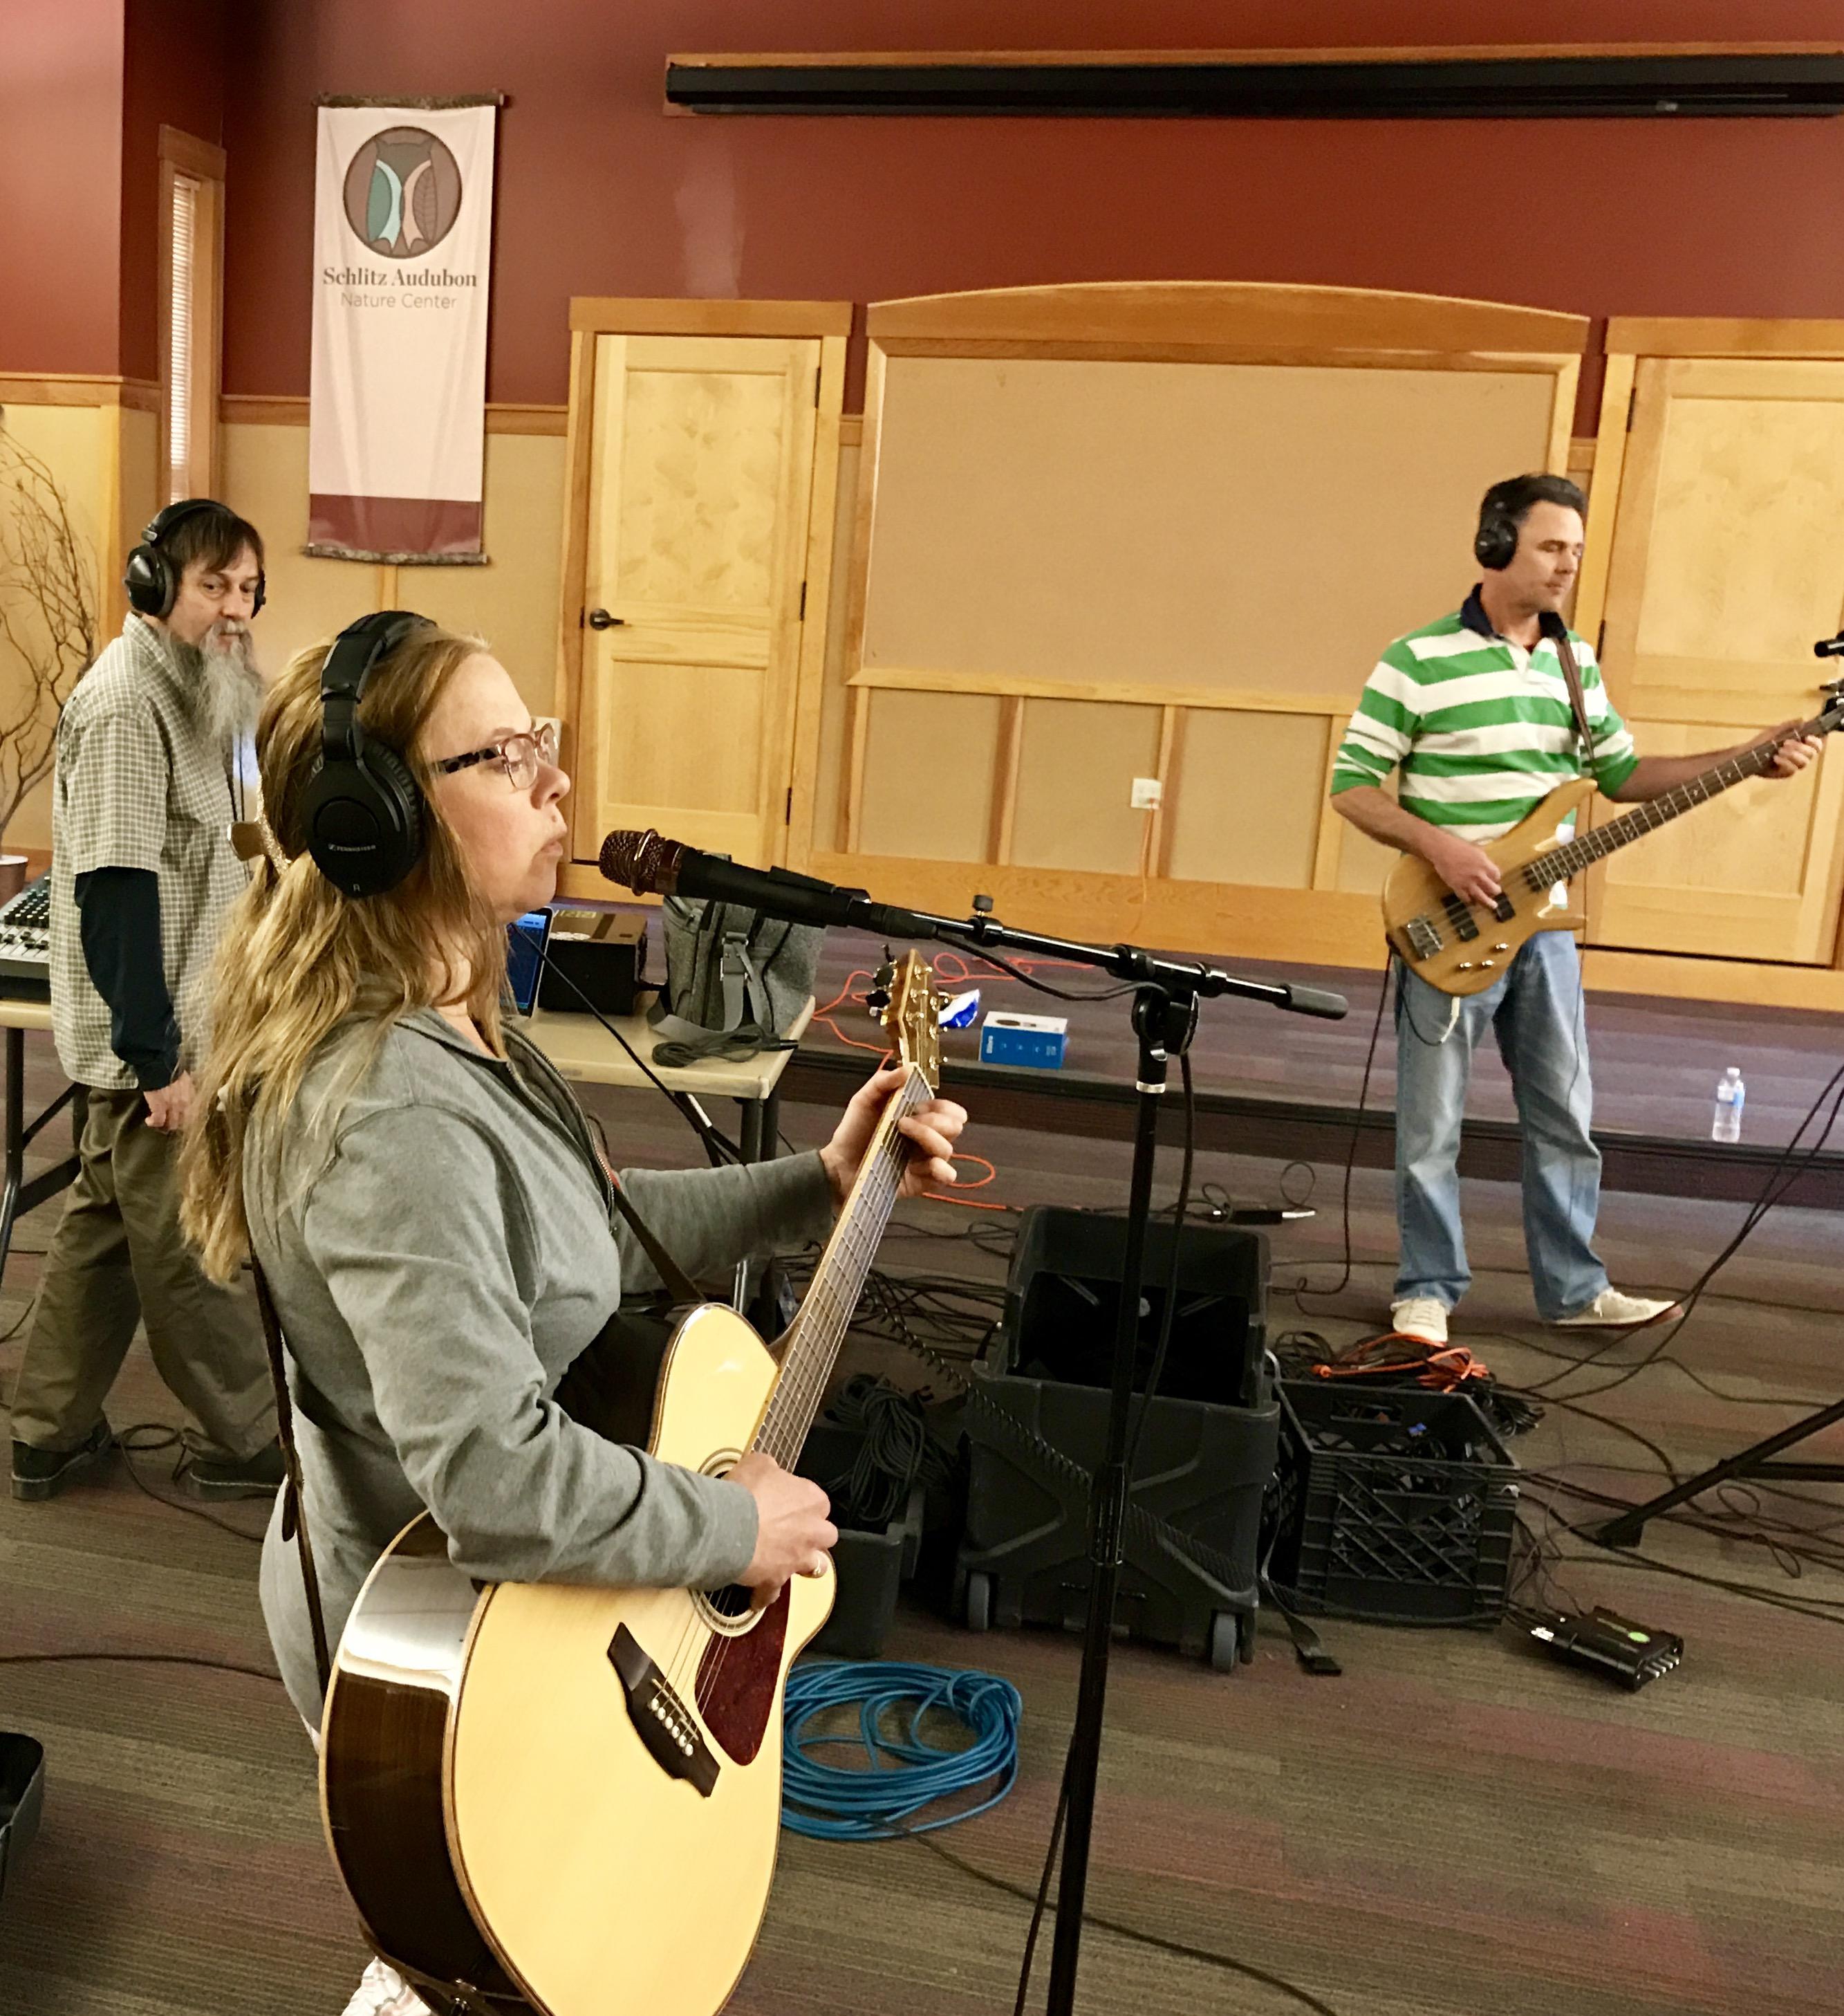 Guerilla Recording in Acoustic Spaces